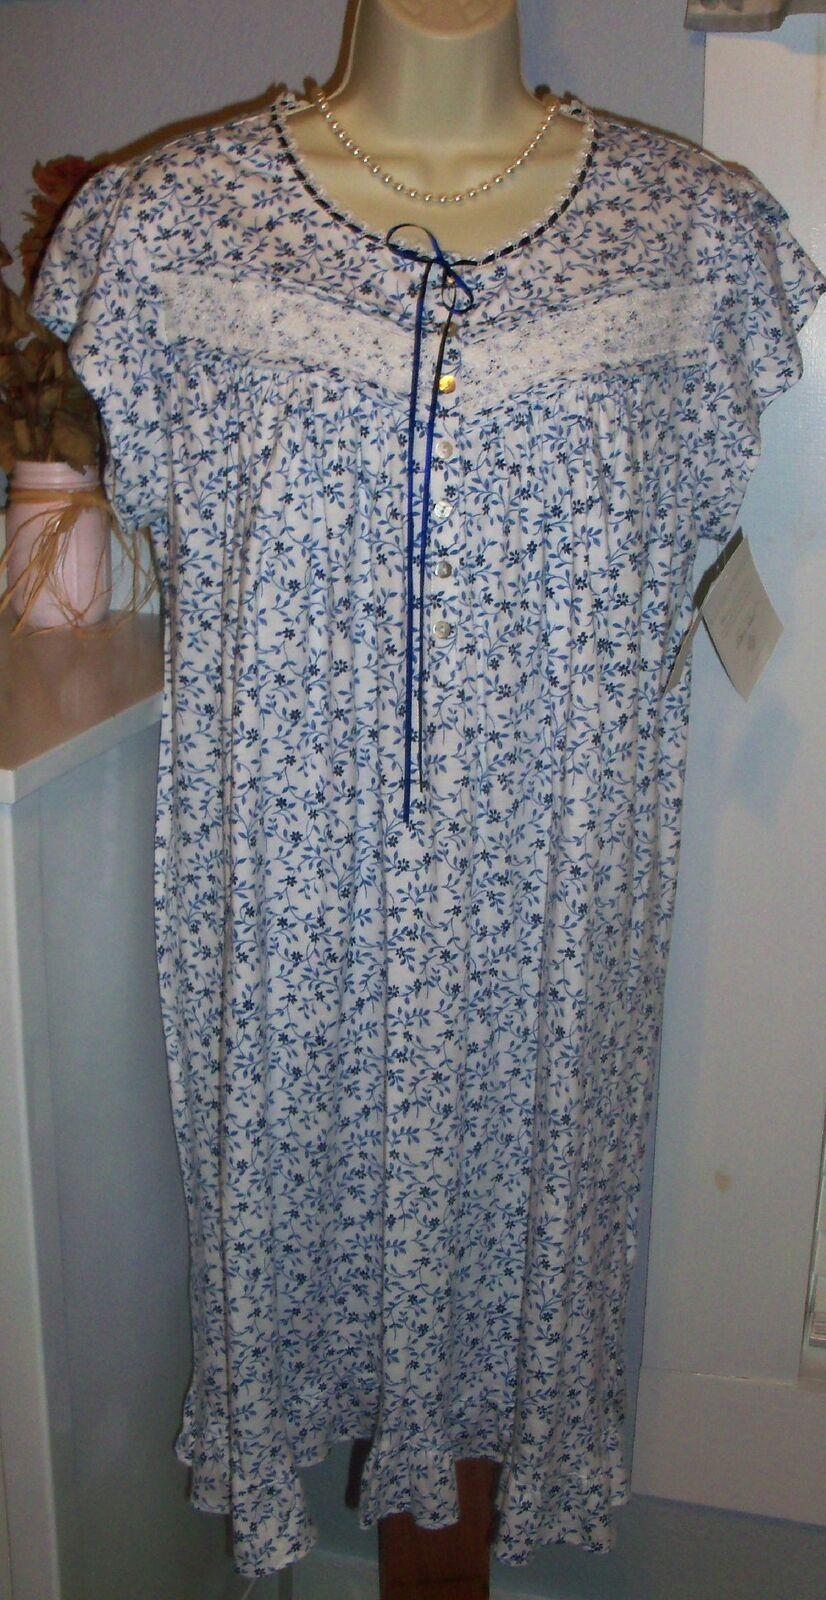 2x Eileen West Nightgown 100 Cotton Knit Gown Blue Floral Soft Short ... 321a13d73